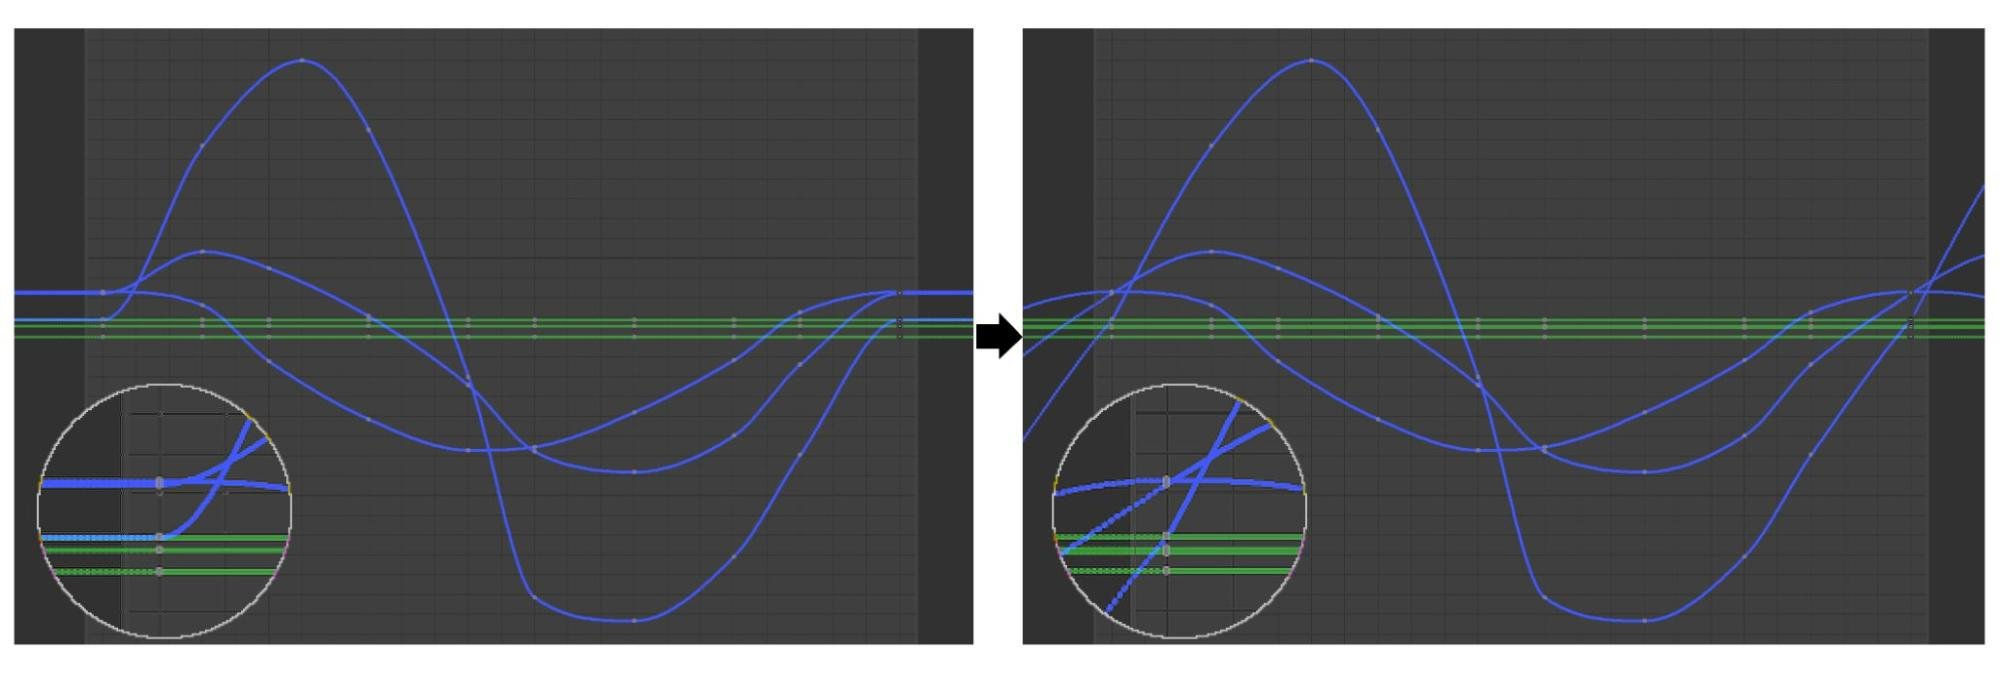 animation loop image